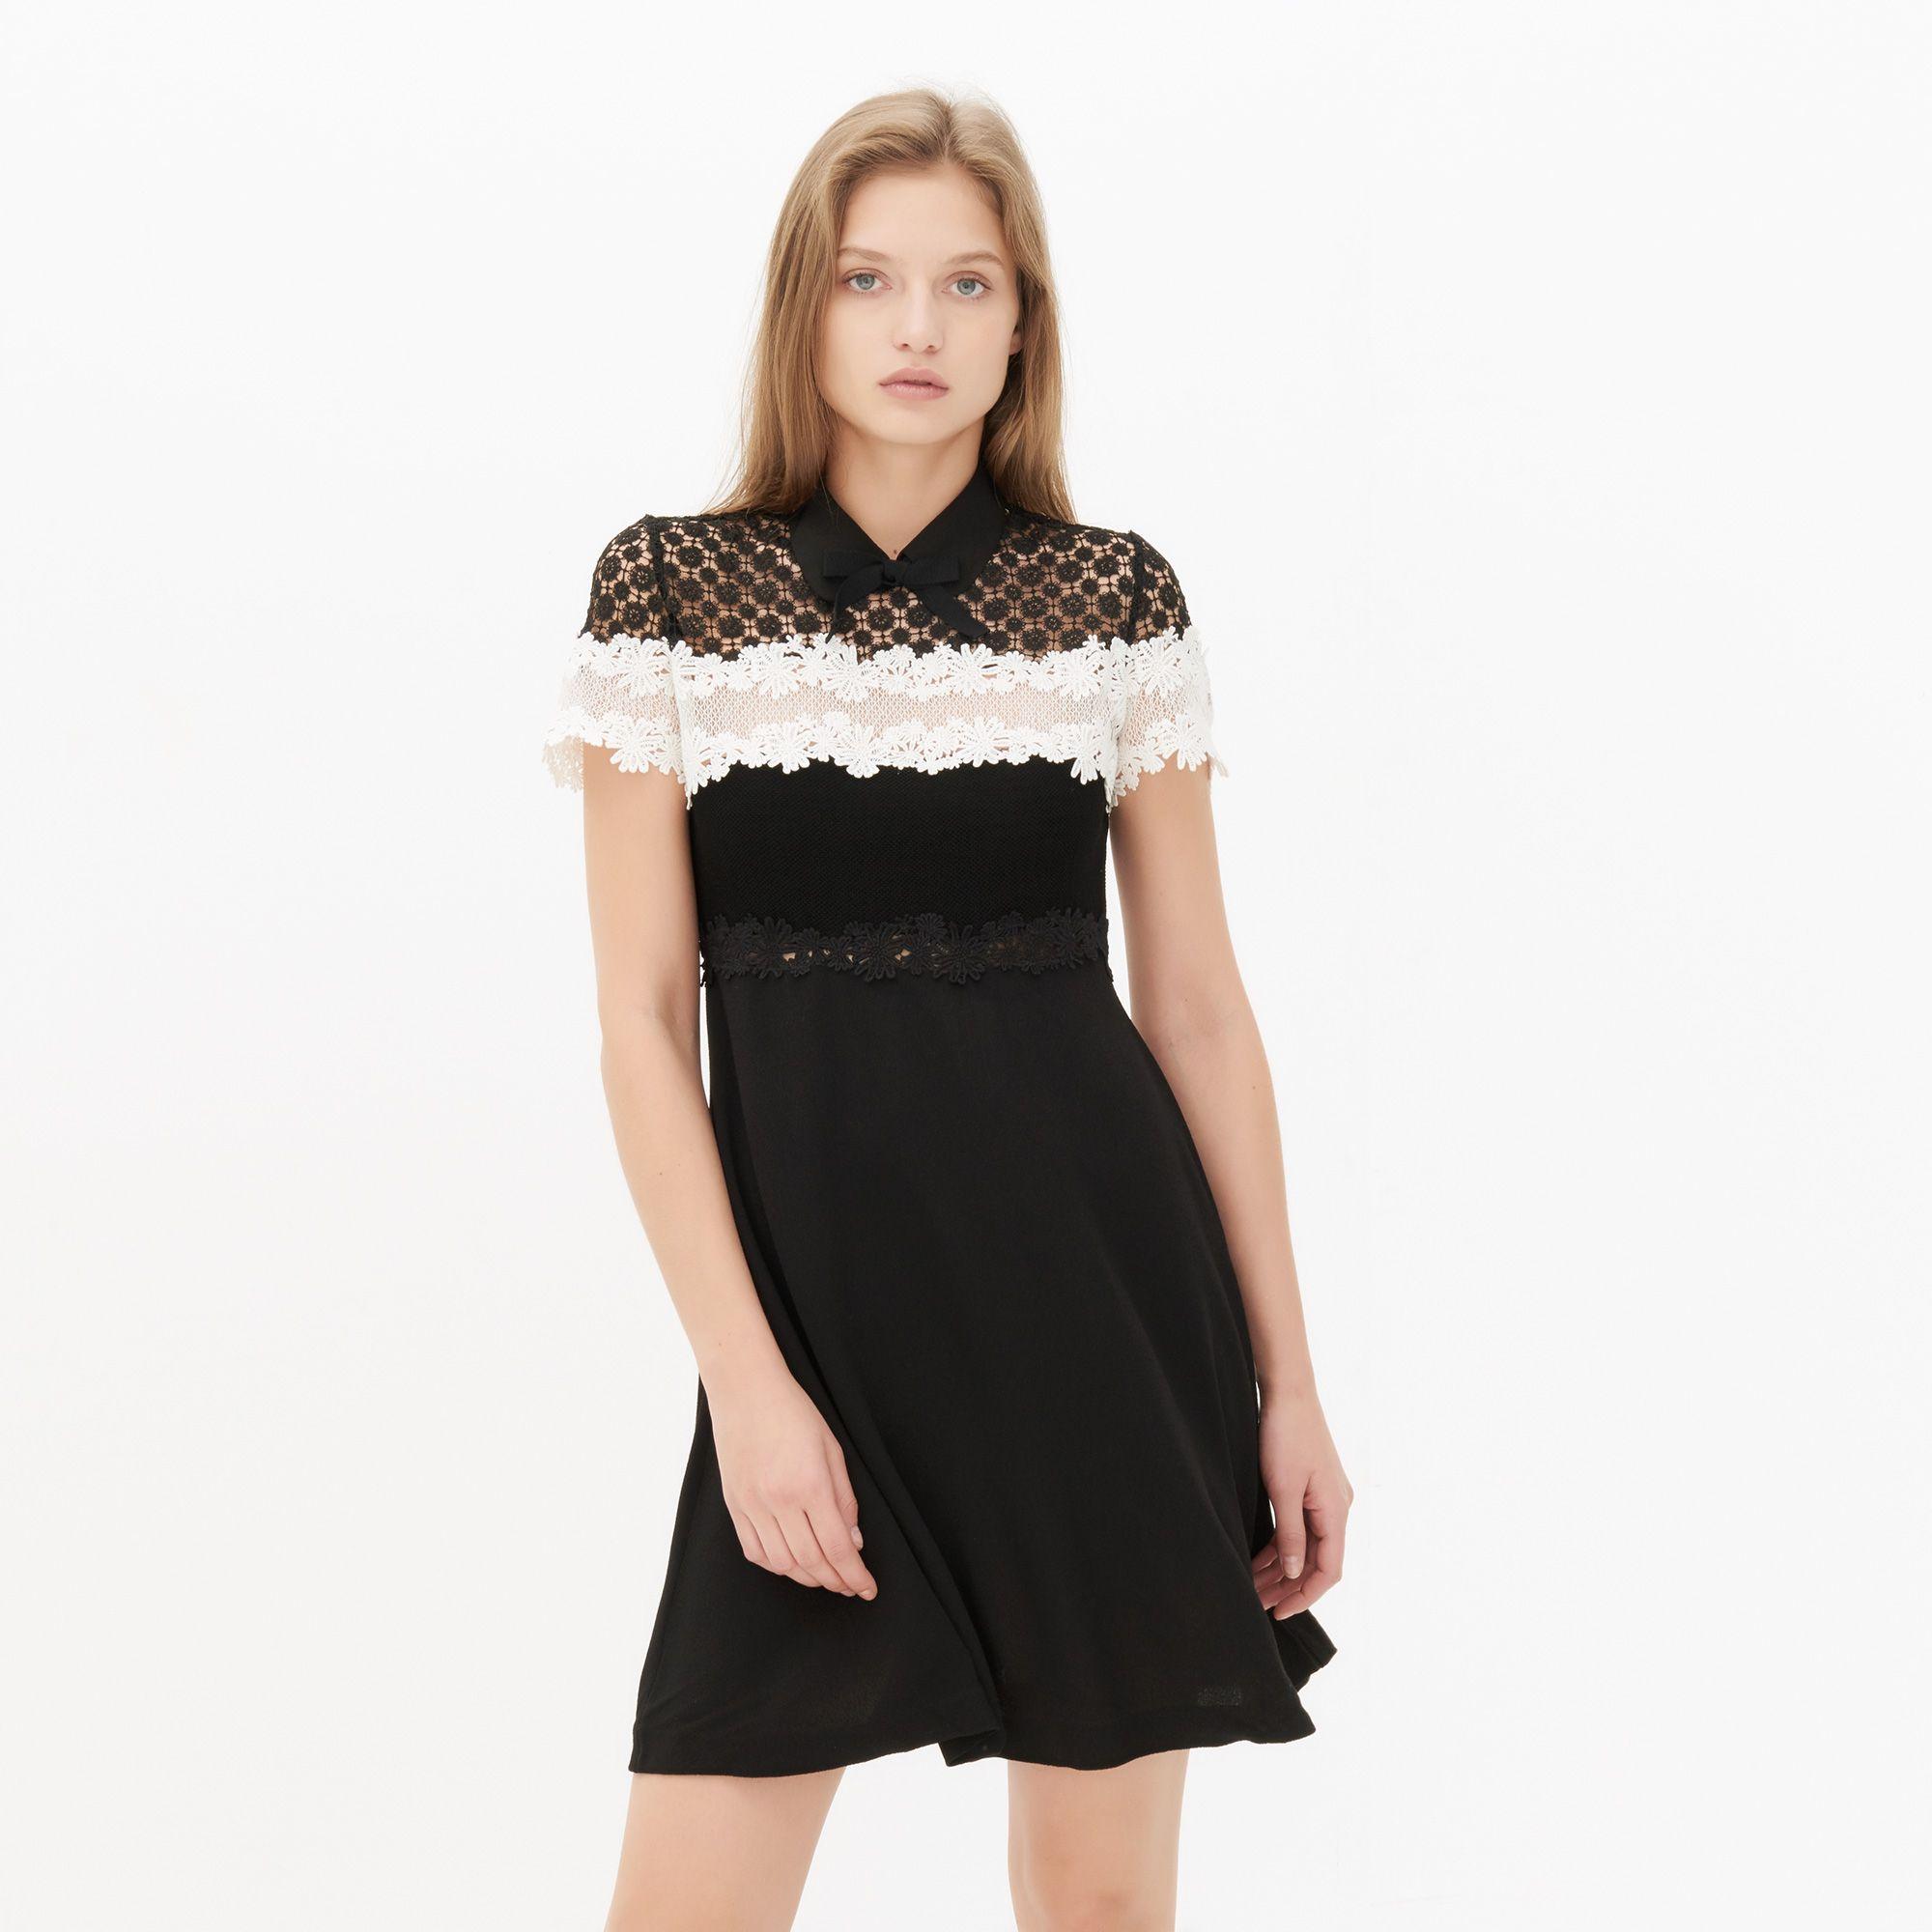 Black dress with white peter pan collar - Short Sleeved Sandro Dress With A Peter Pan Collar And A Ribbon To Tie